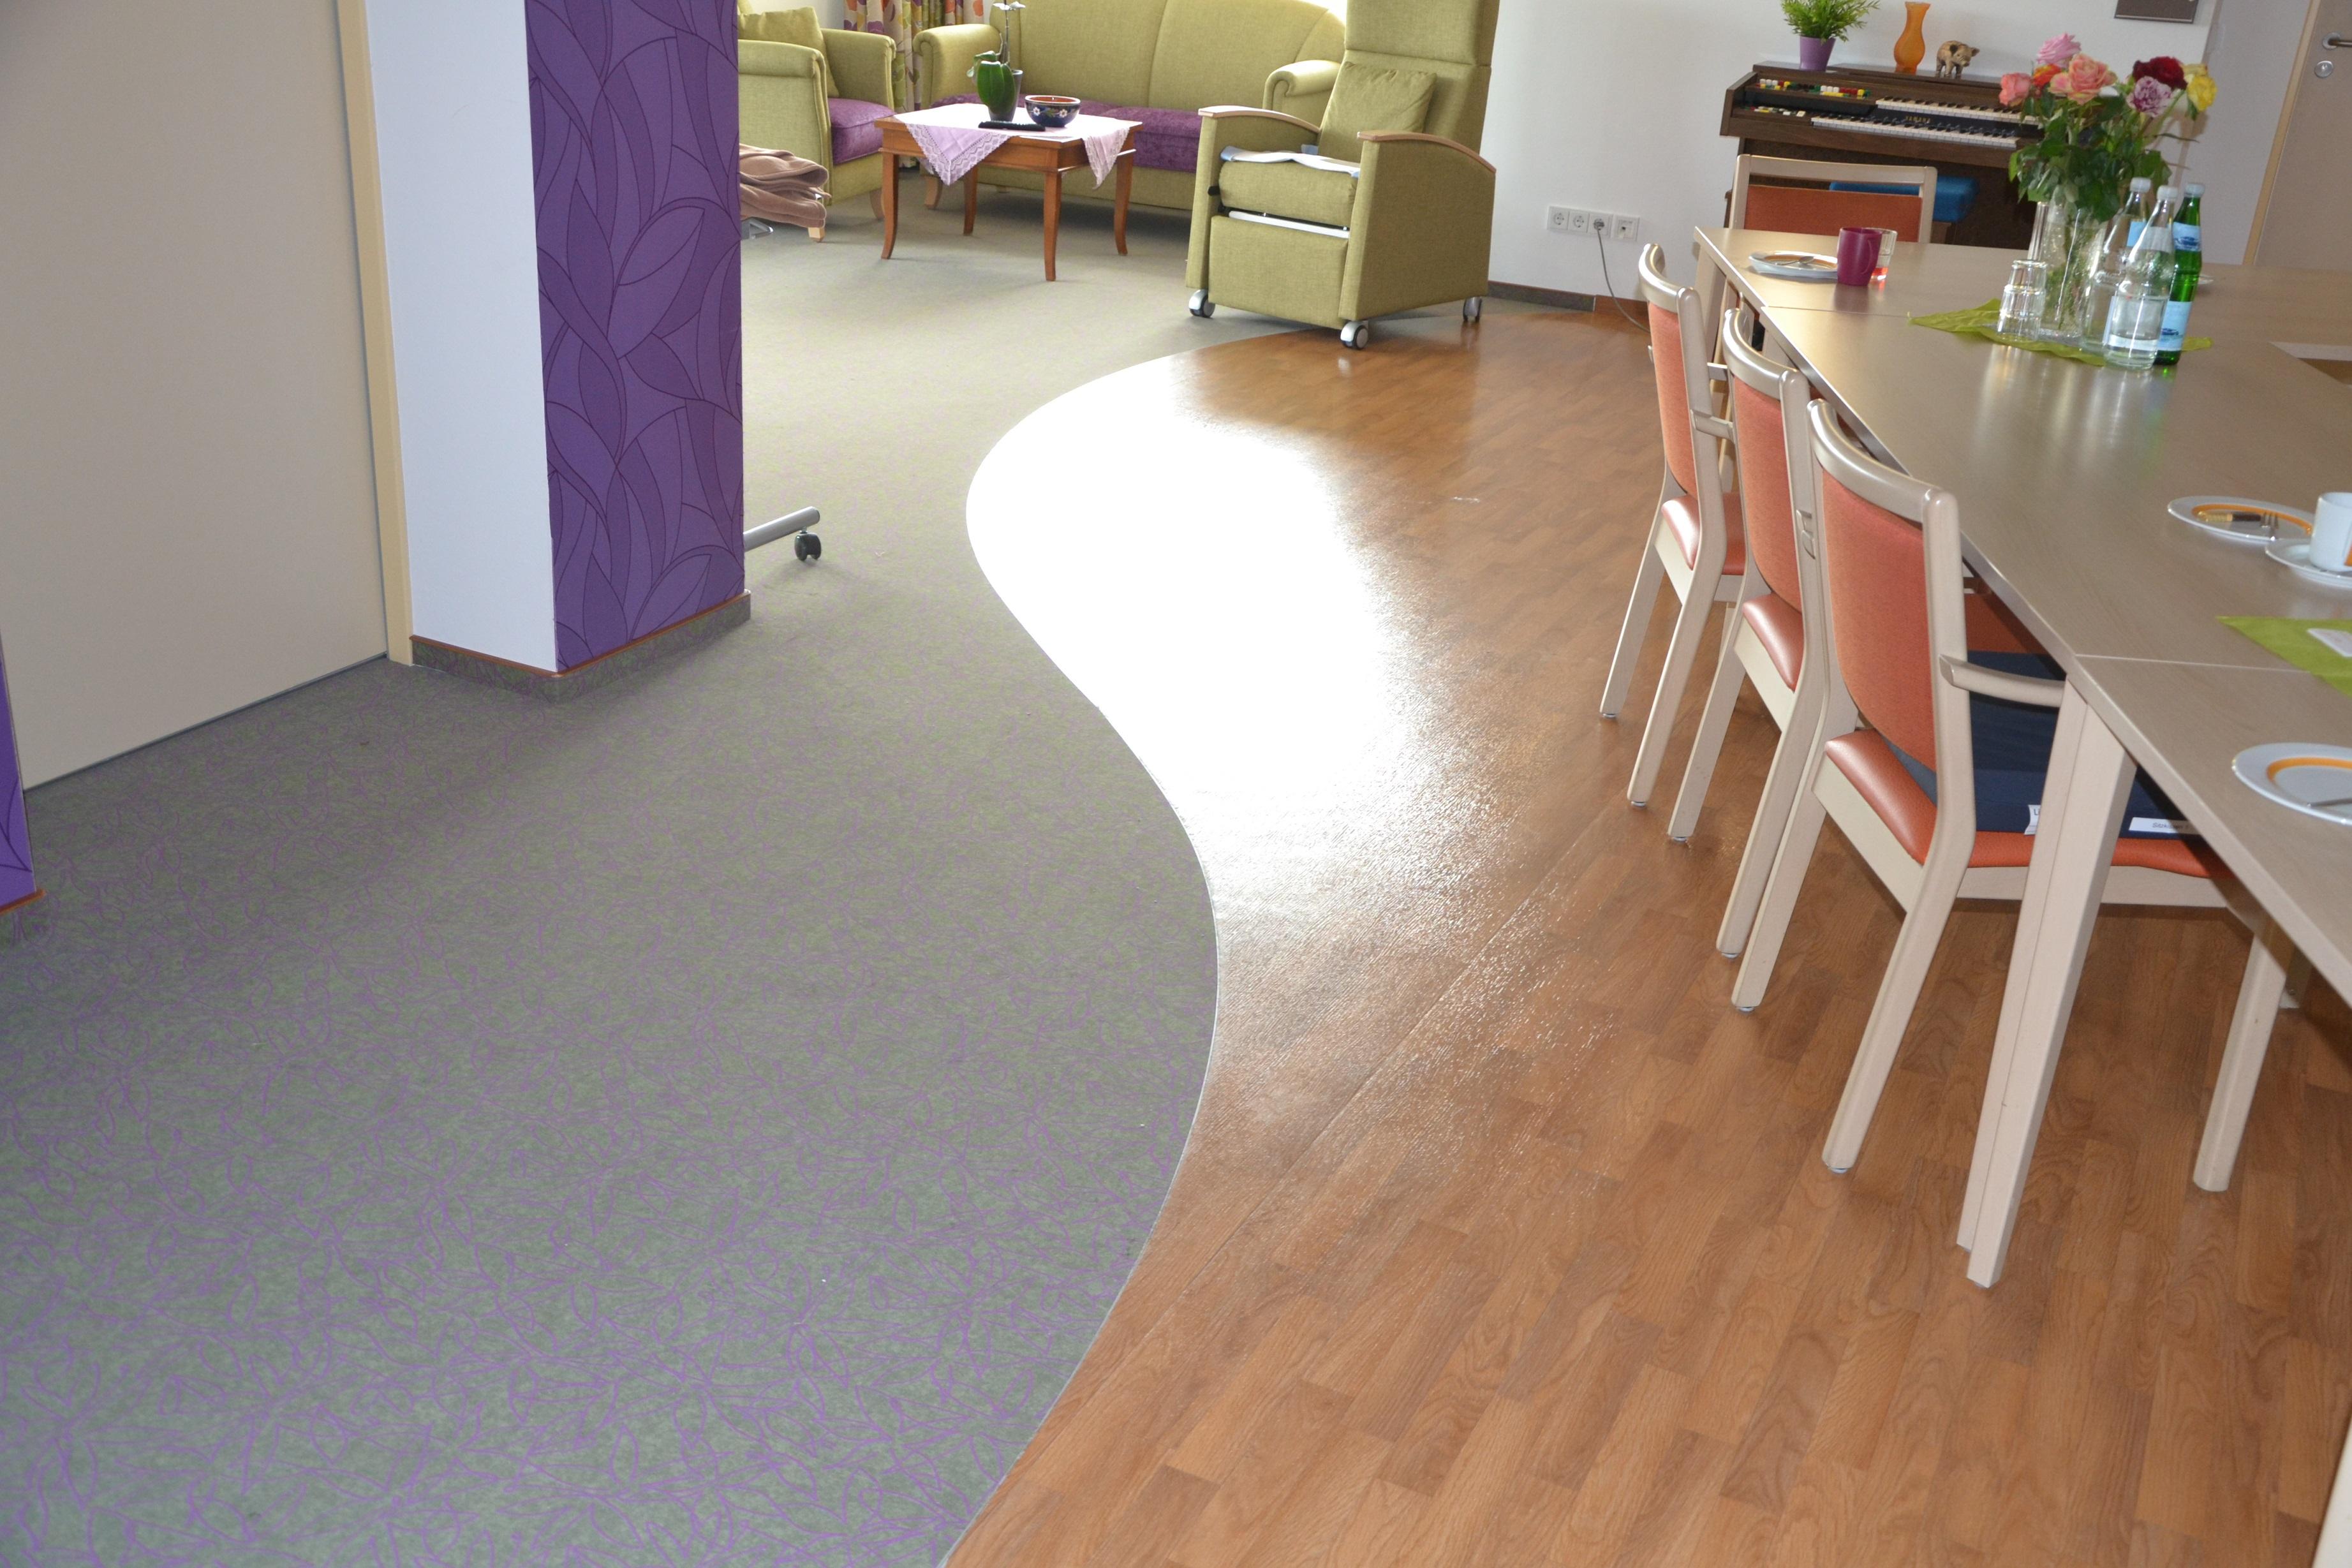 vinylboden auf teppich affordable frs badezimmer with vinylboden auf teppich beautiful. Black Bedroom Furniture Sets. Home Design Ideas